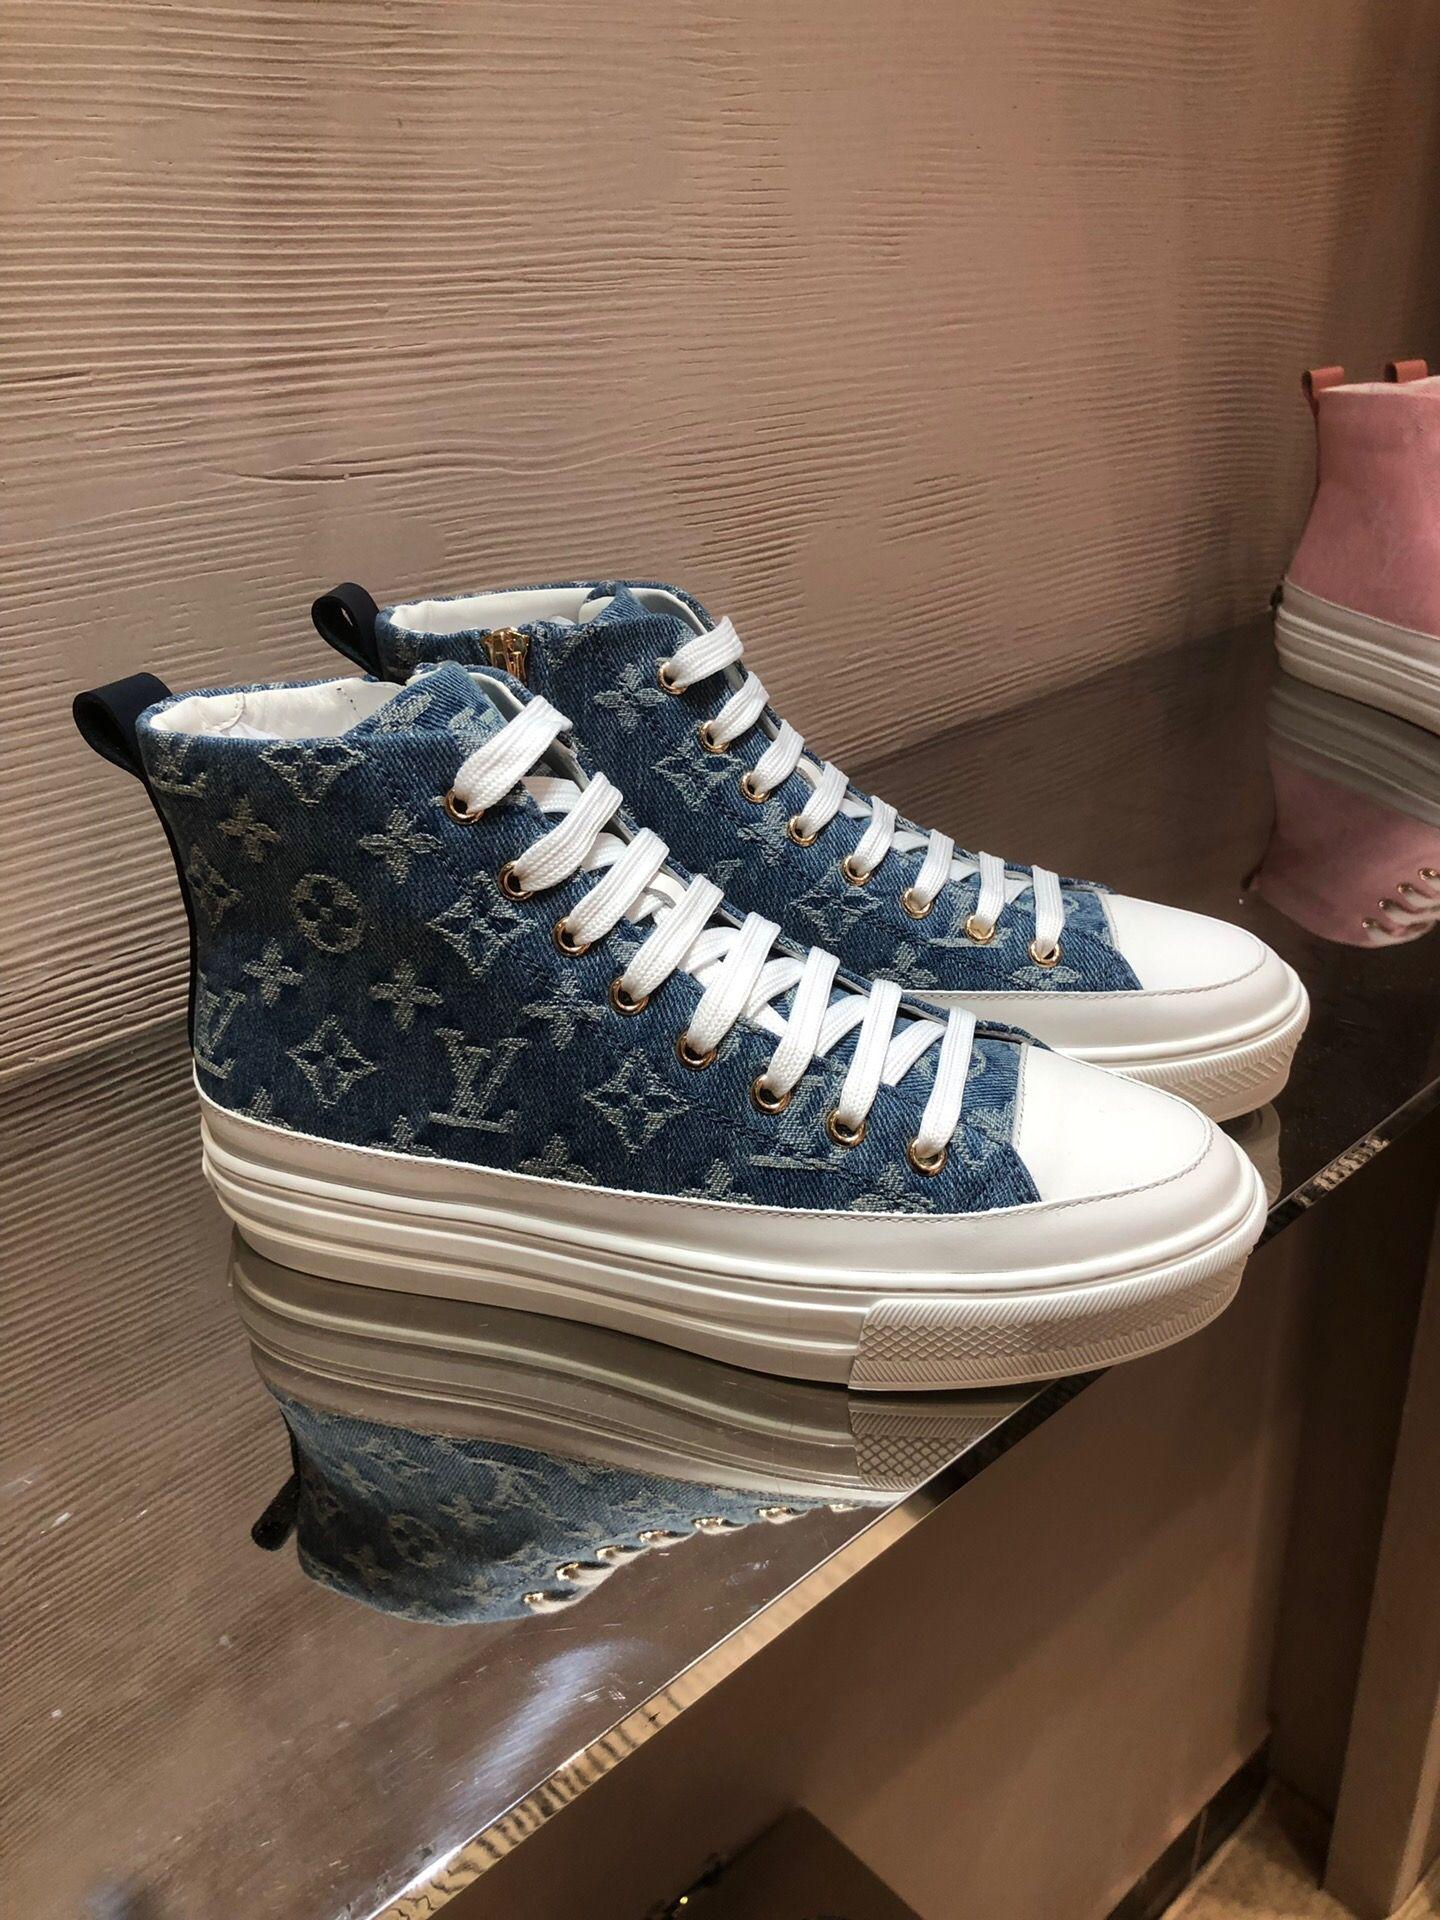 louis vuitton LV Fastlane Sneaker Denim Monogram Luxury DESIGNERS Womans Lace Up Sneakers Femmes Mode Baskets Concepteurs Outdoor Chaussures Casual